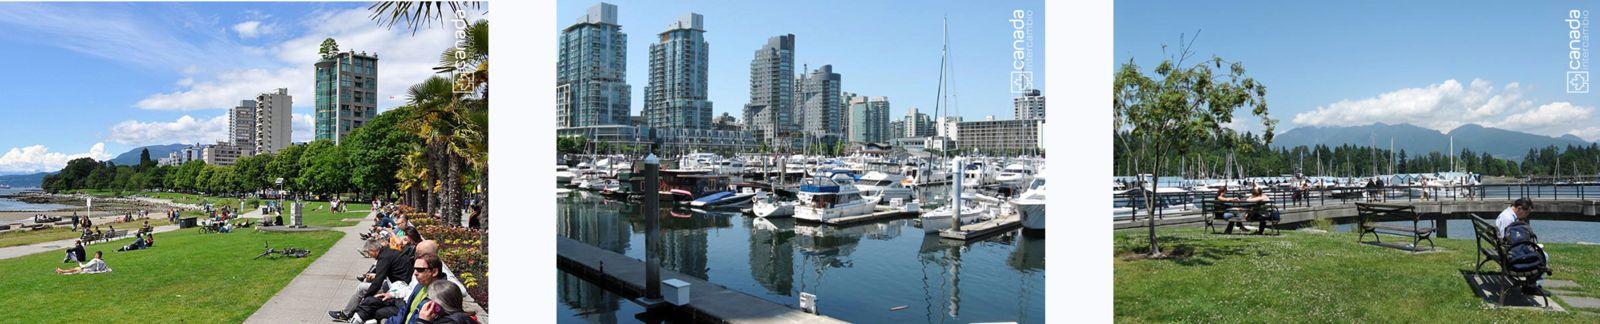 west End, regiao turistica de Vancouver